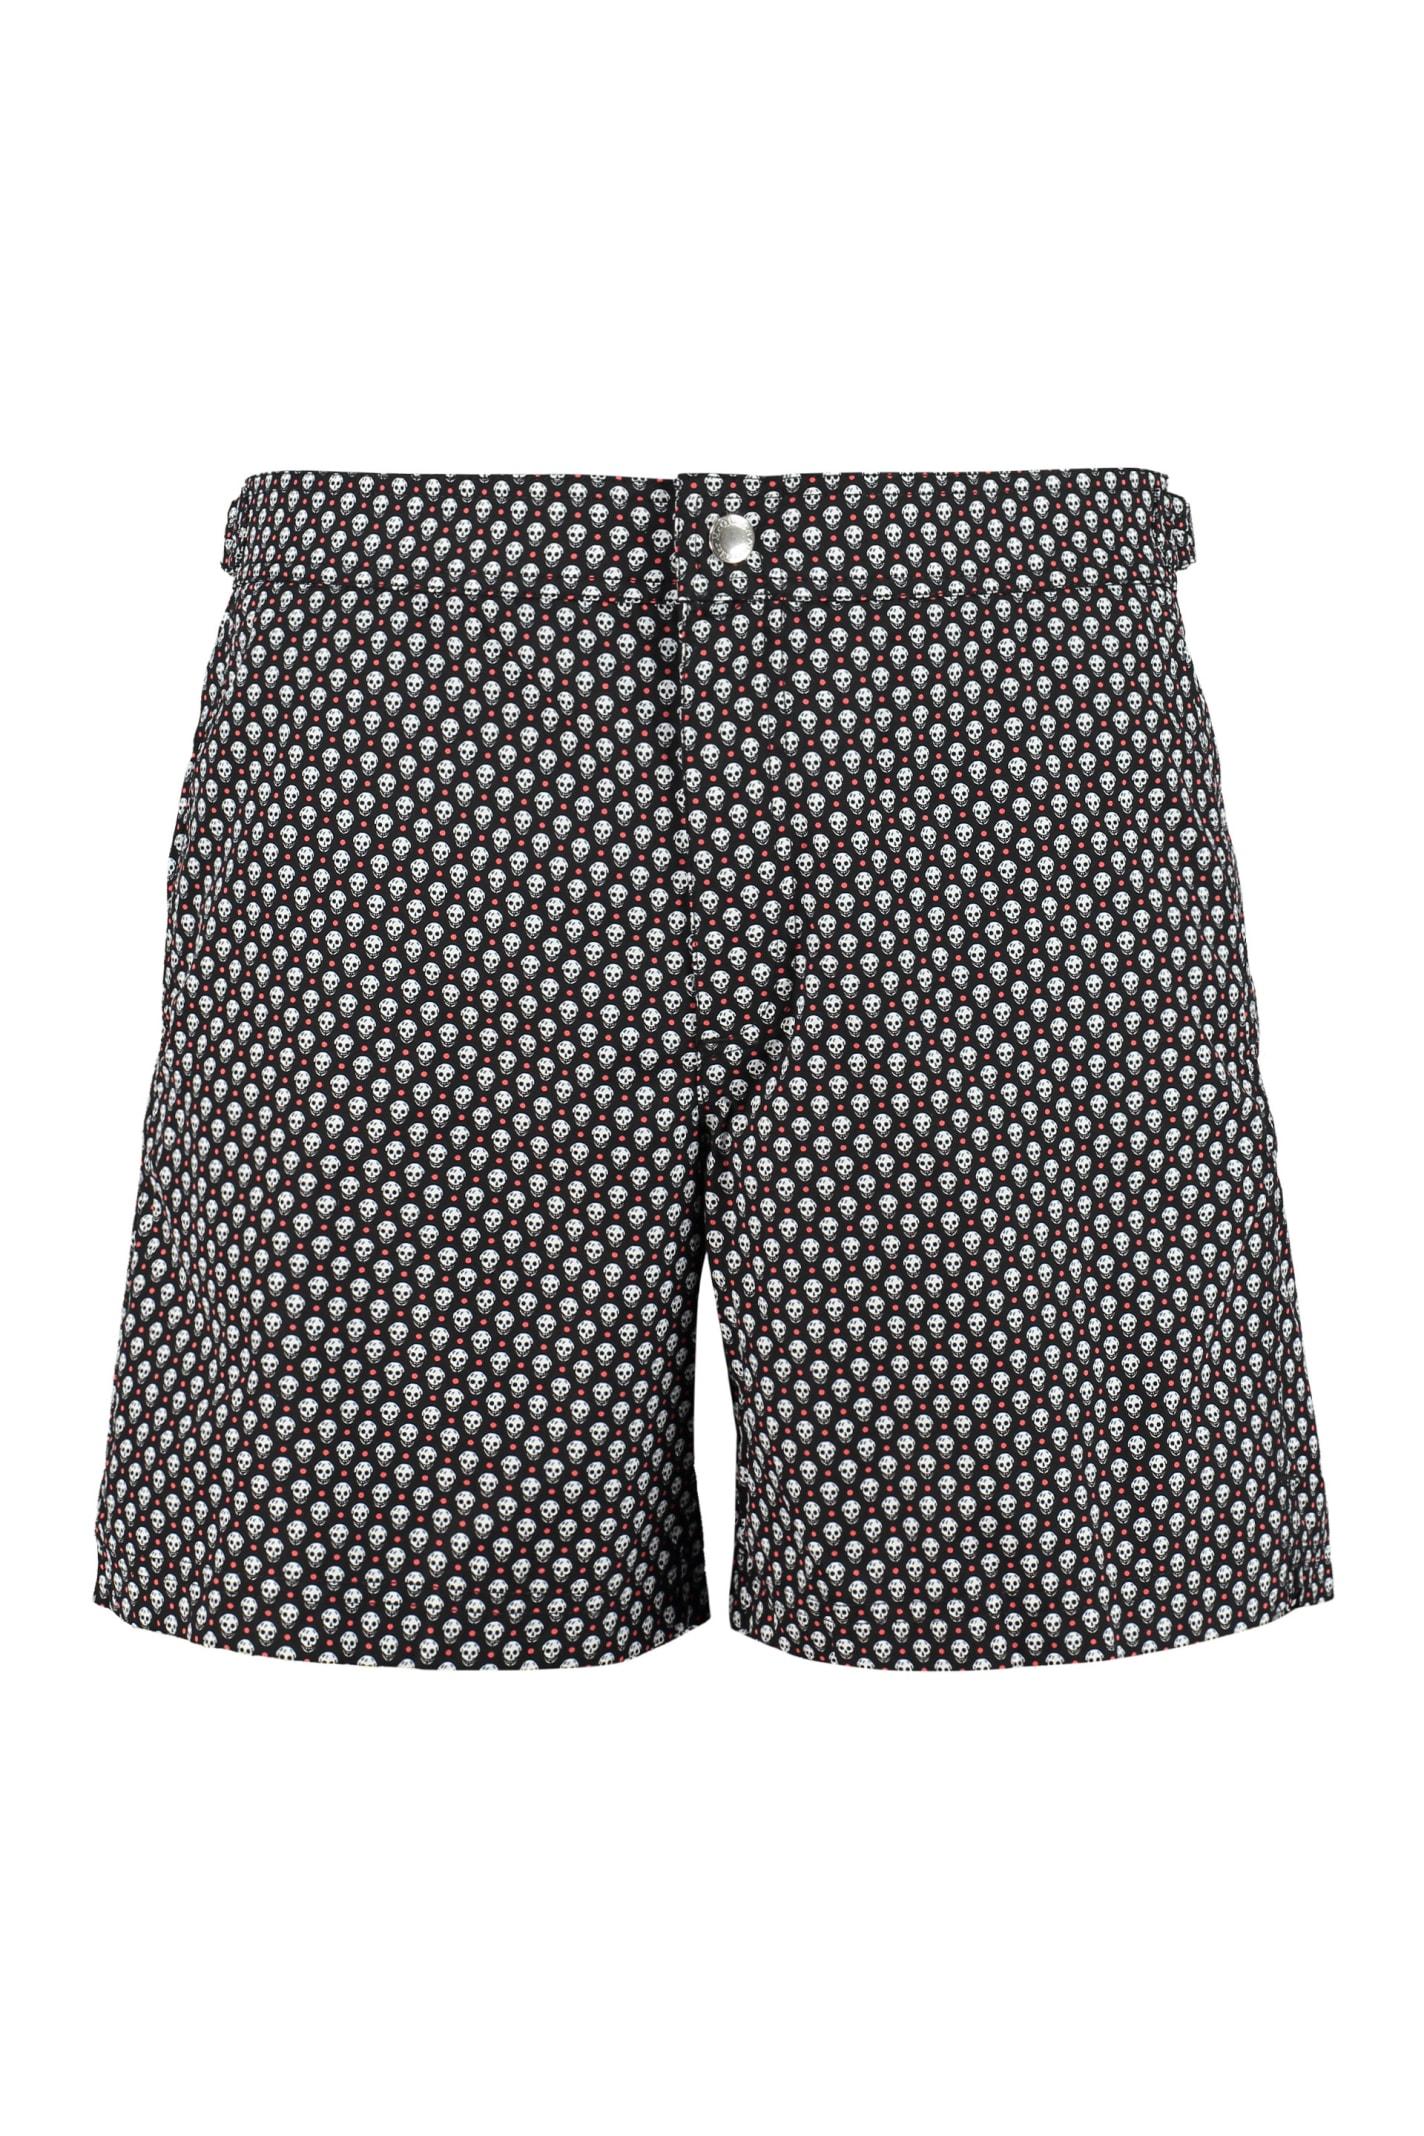 Alexander McQueen Sw Dots Skull Buttoned Shorts